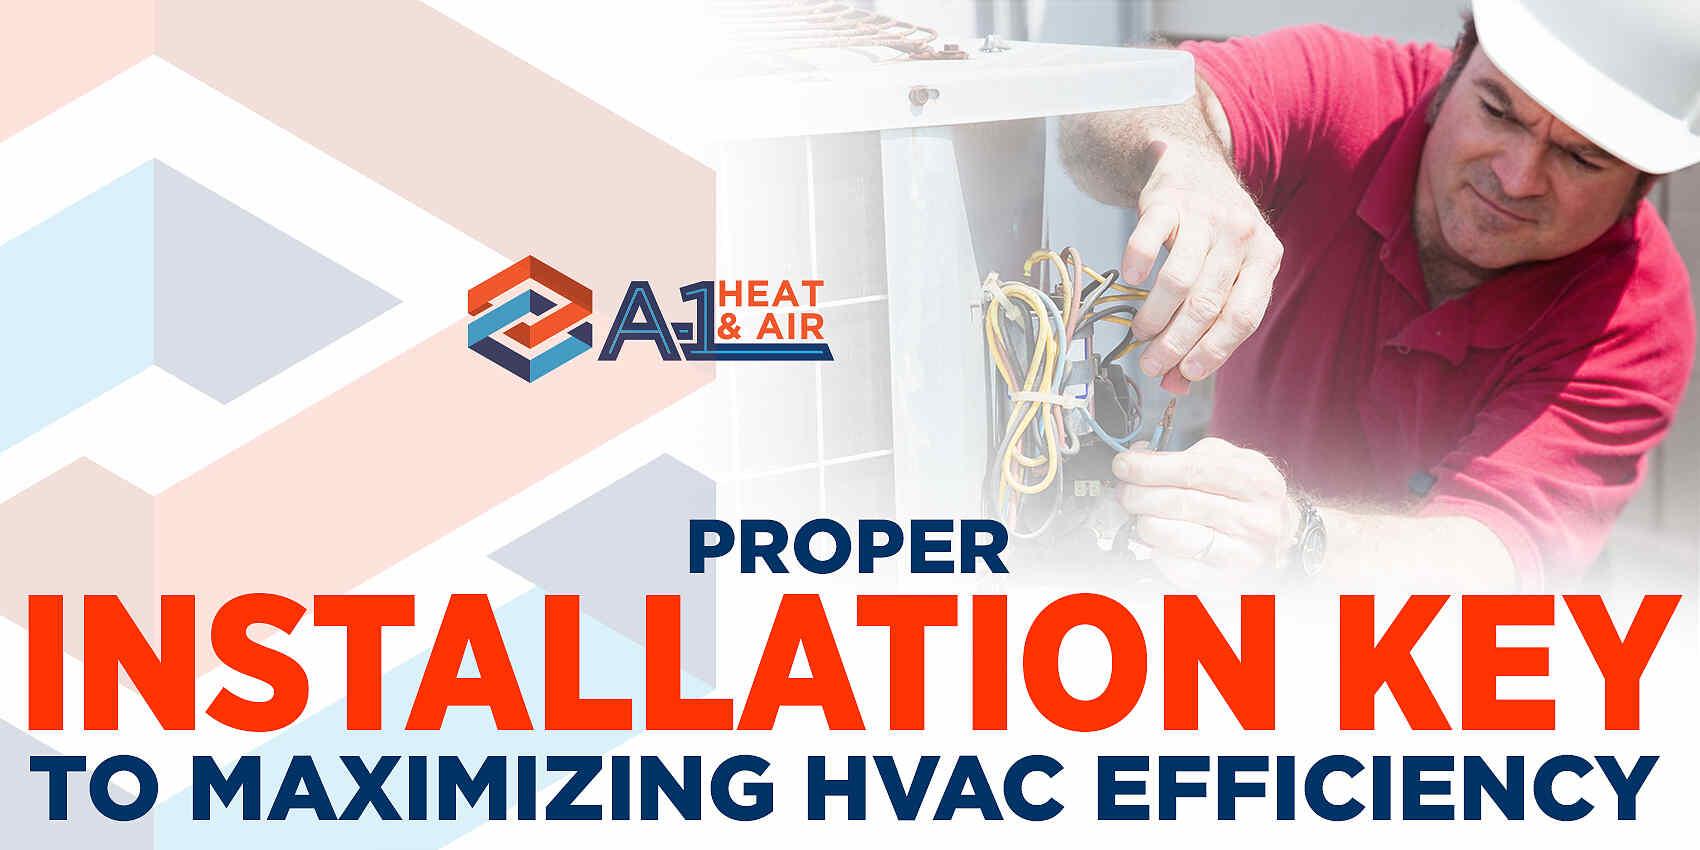 Proper Installation Key To Maximizing HVAC Efficiency